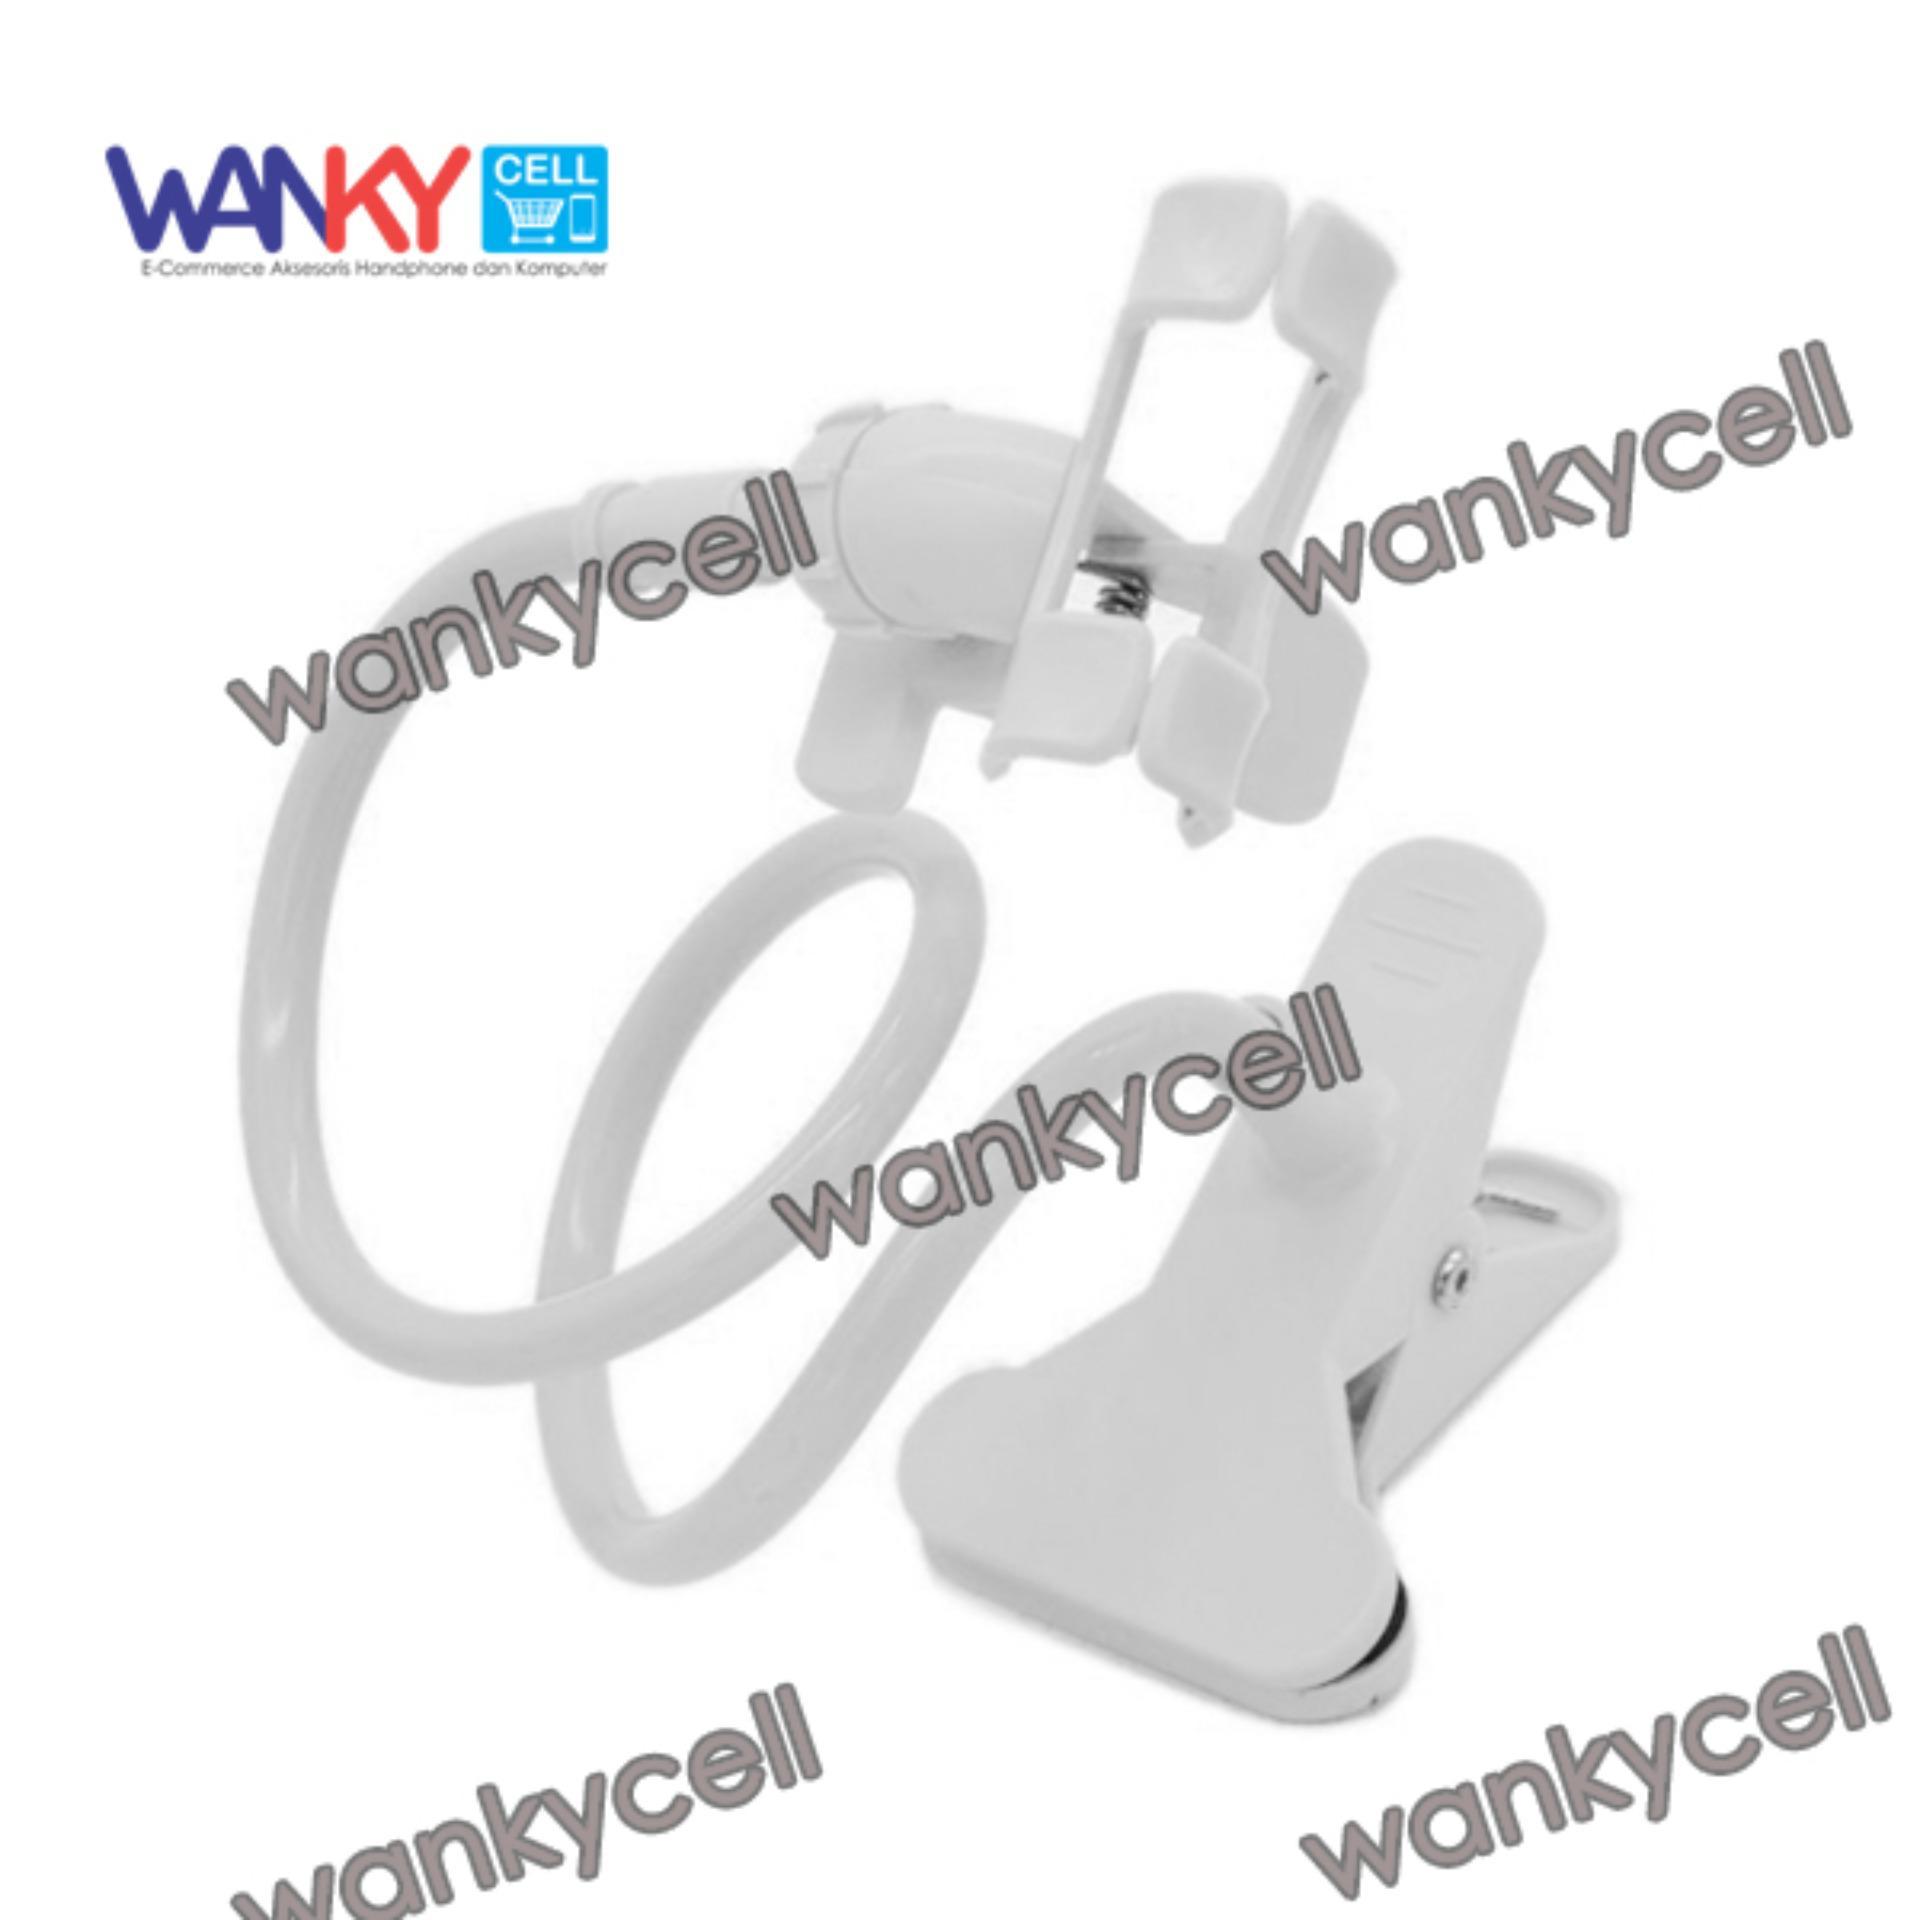 Jual Lazypod Penyangga Smartphone Mobile Jepsis Jepitan Narsis Putih Ori